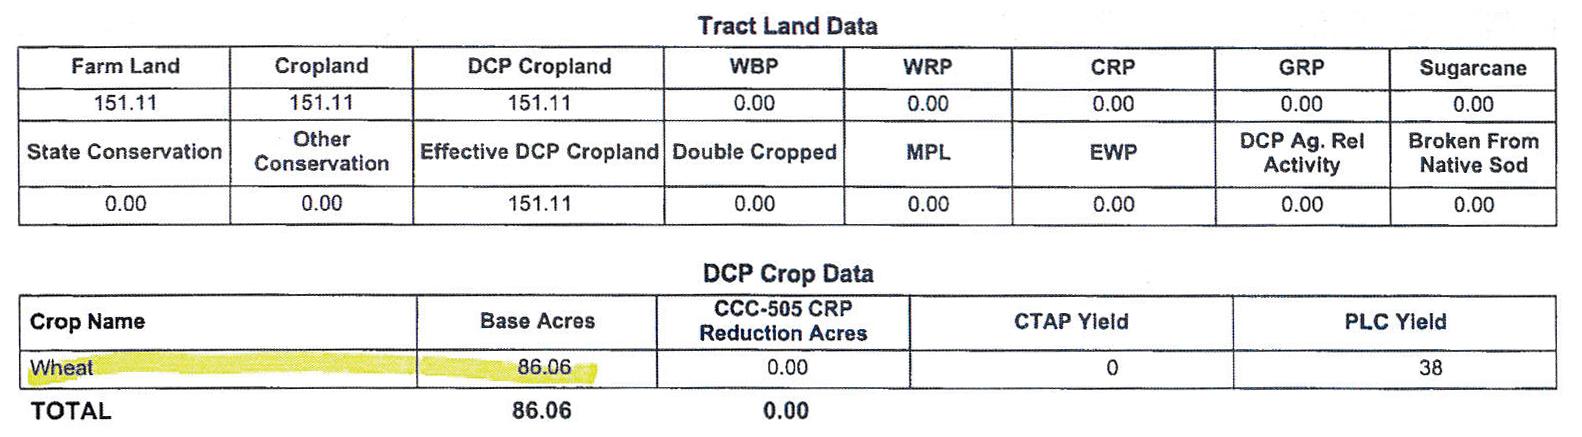 Crop Info BIR-1021